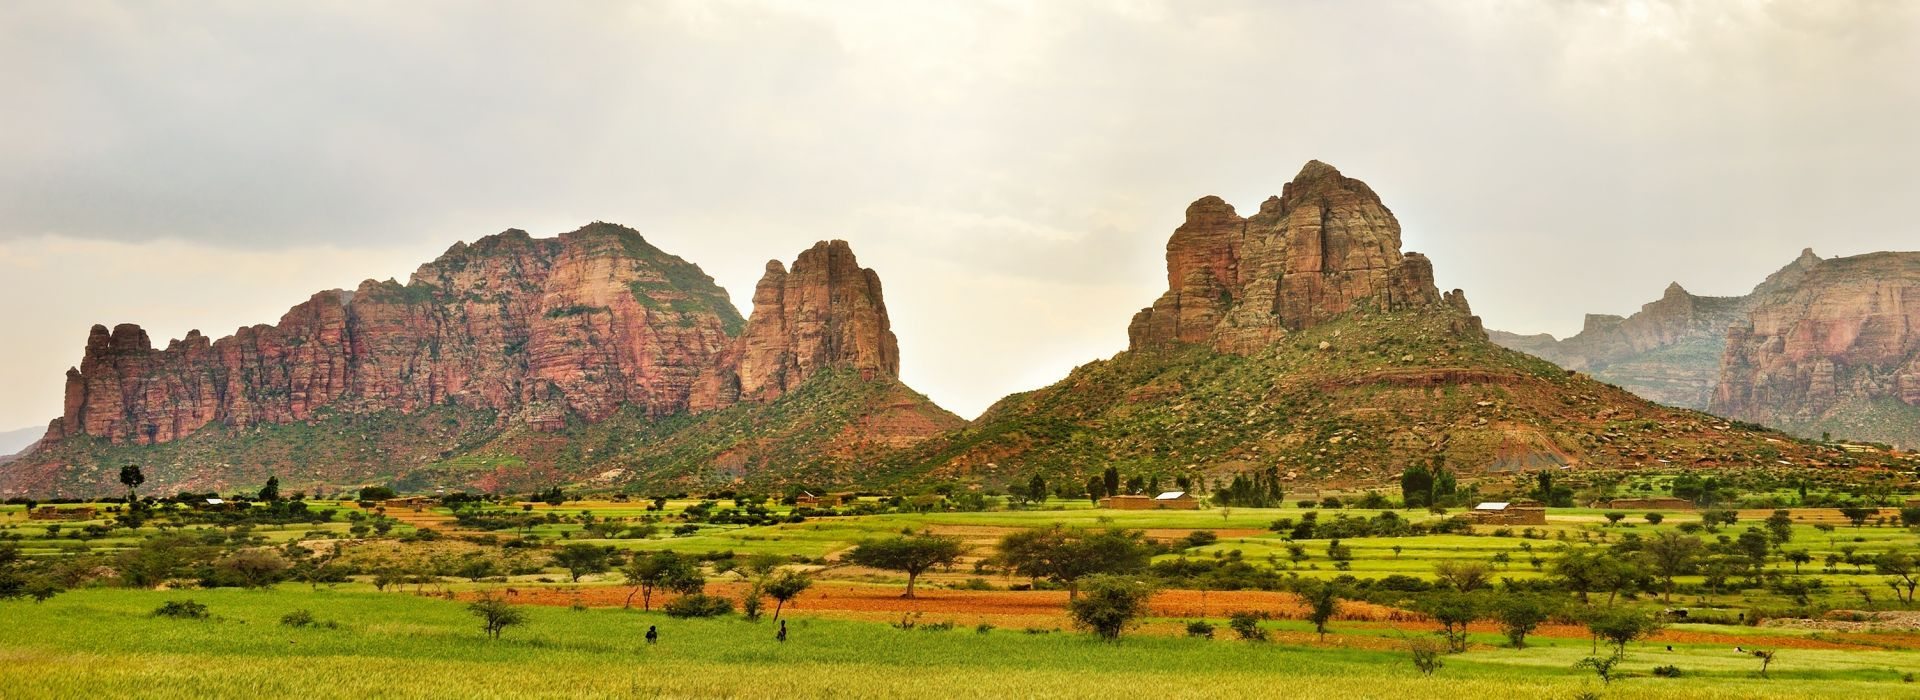 Wildlife Tours in Ethiopia